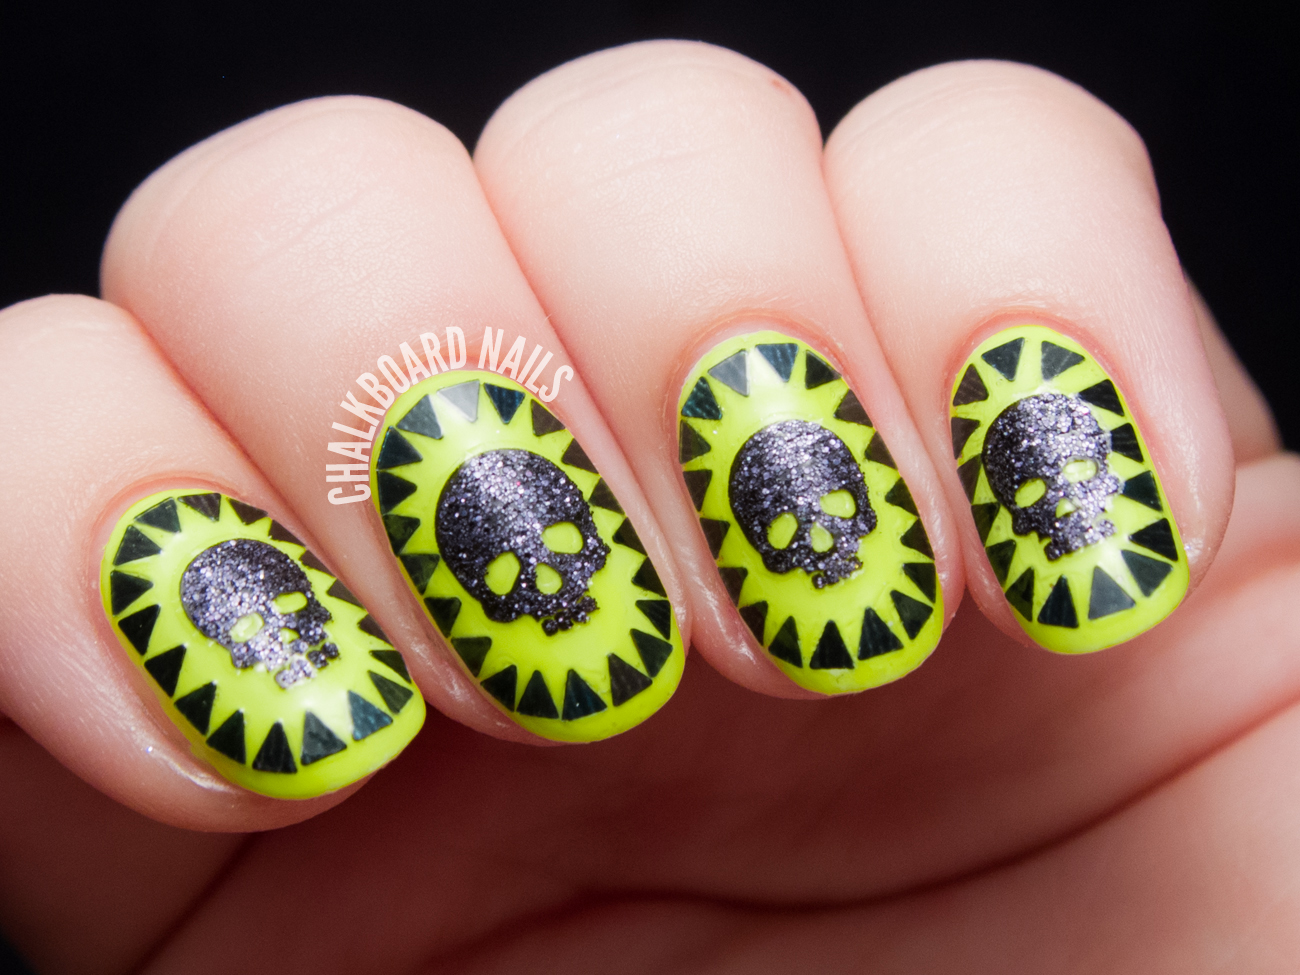 Glittery skull cameo nail art by @chalkboardnails